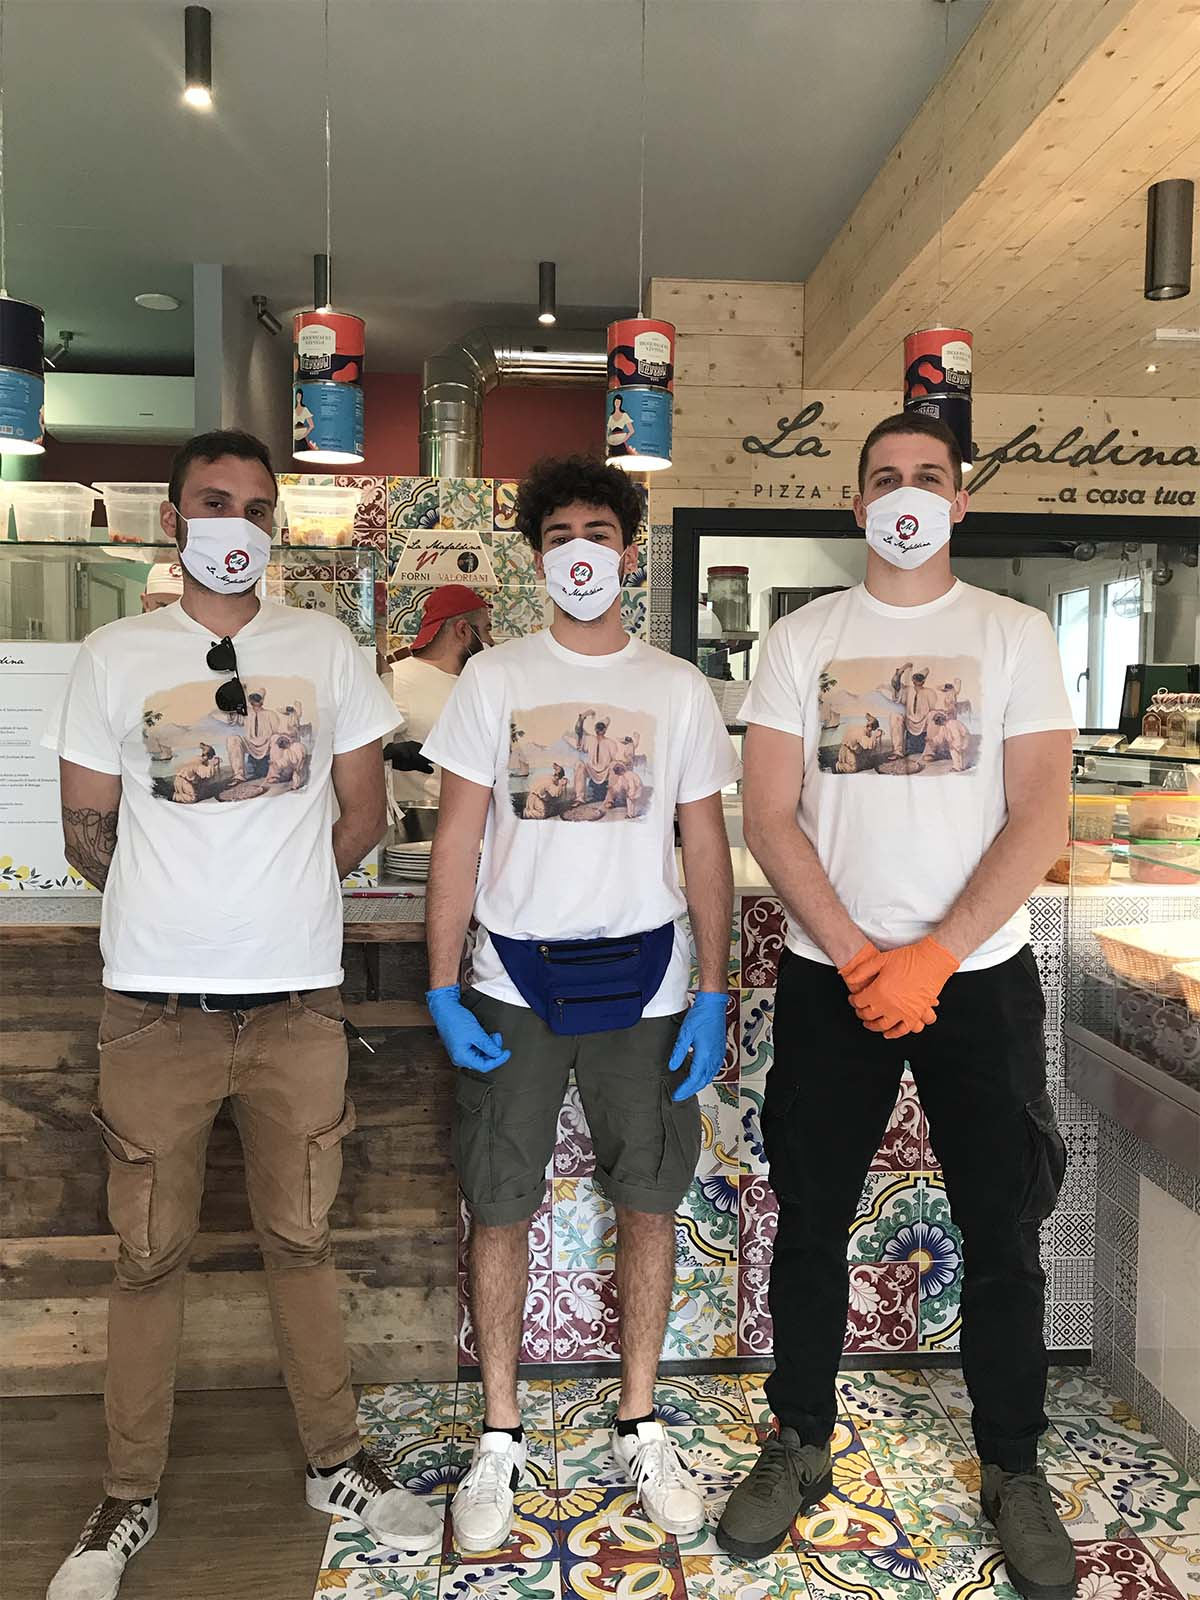 Pizzeria napoletana friggitoria a Padova